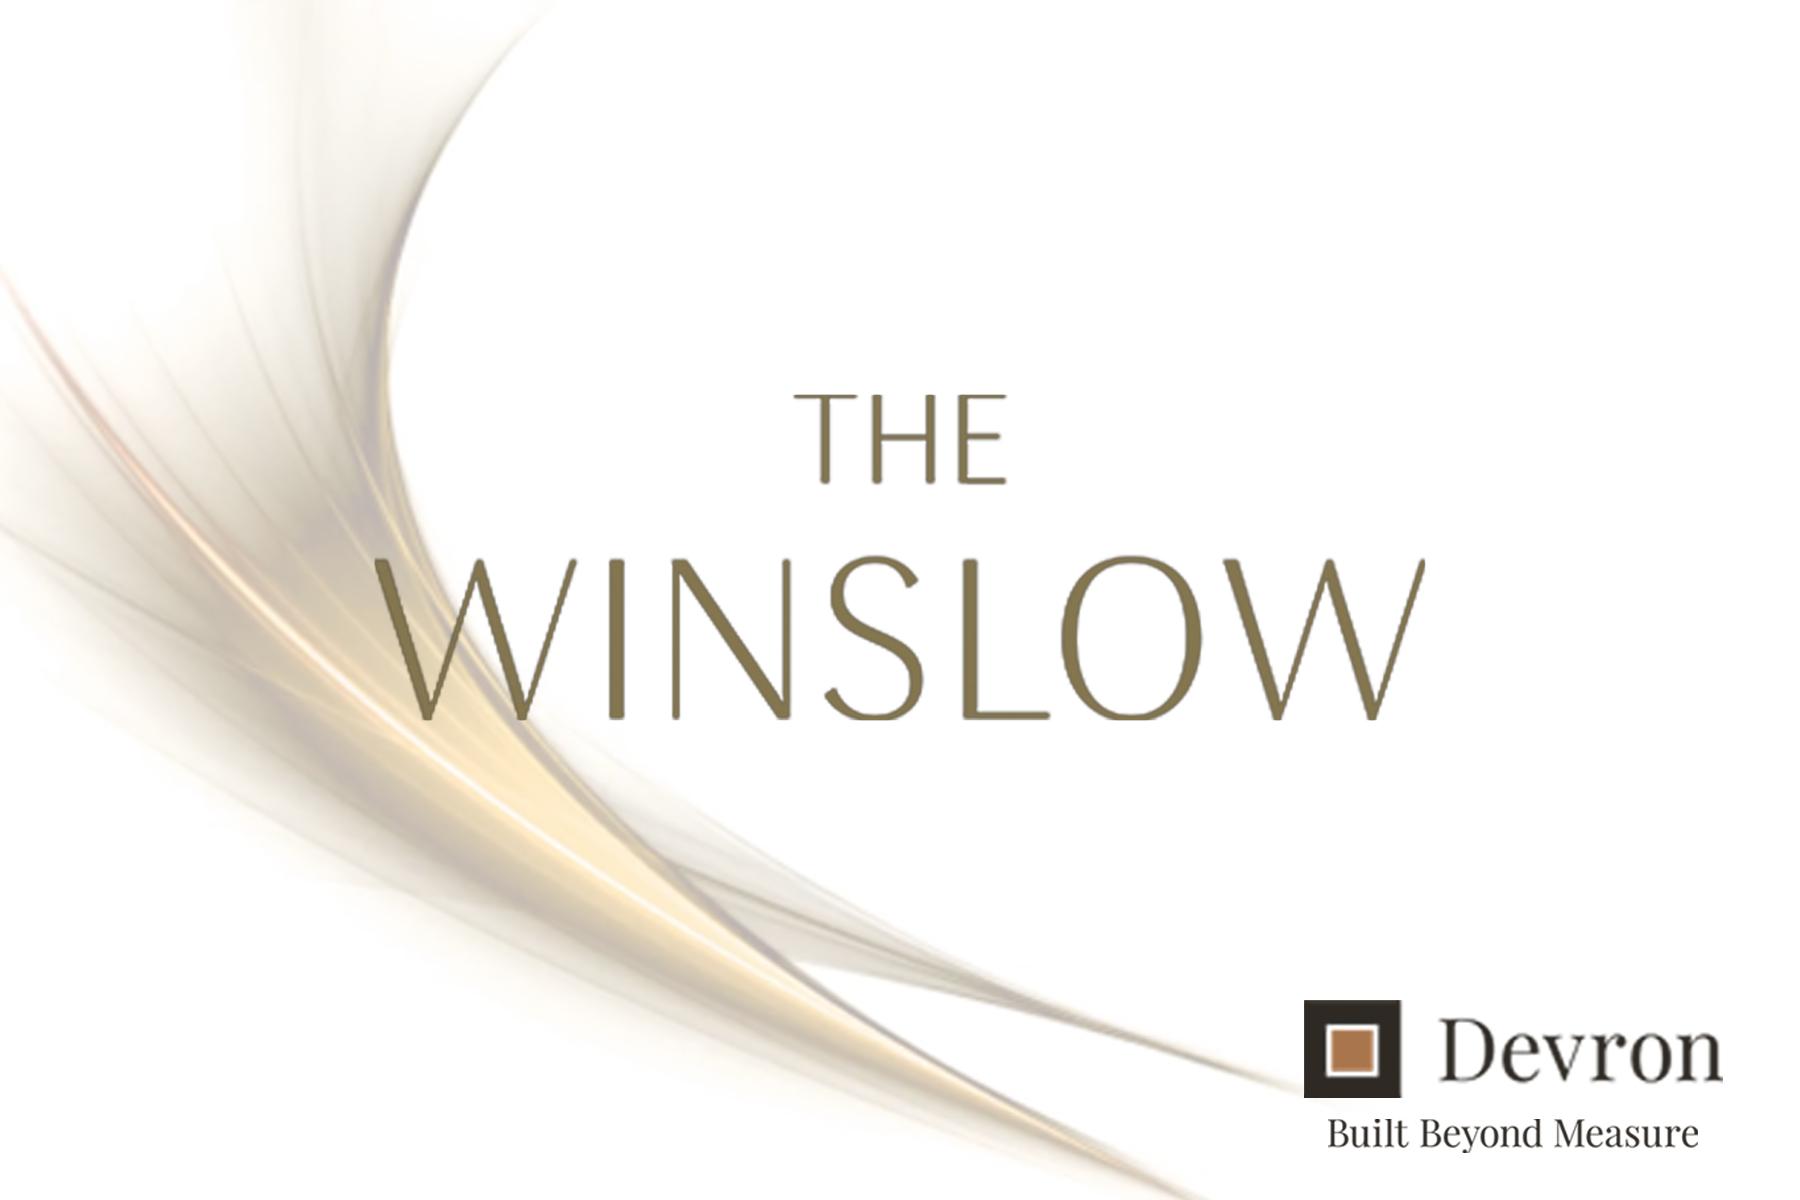 the winslow+logo.jpg